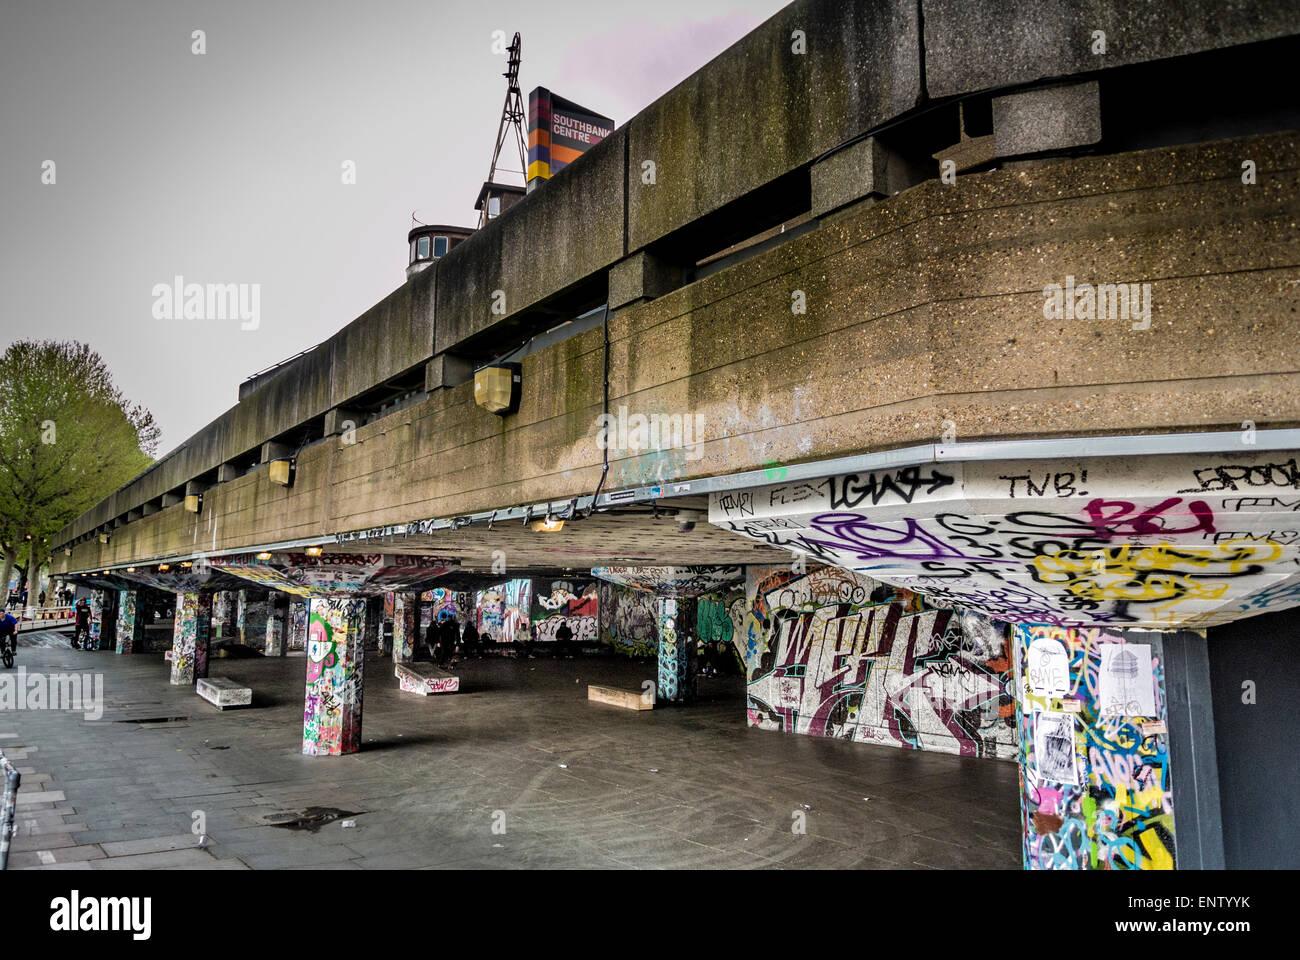 Southbank Skate Park, Southbank Centre di Londra. Immagini Stock